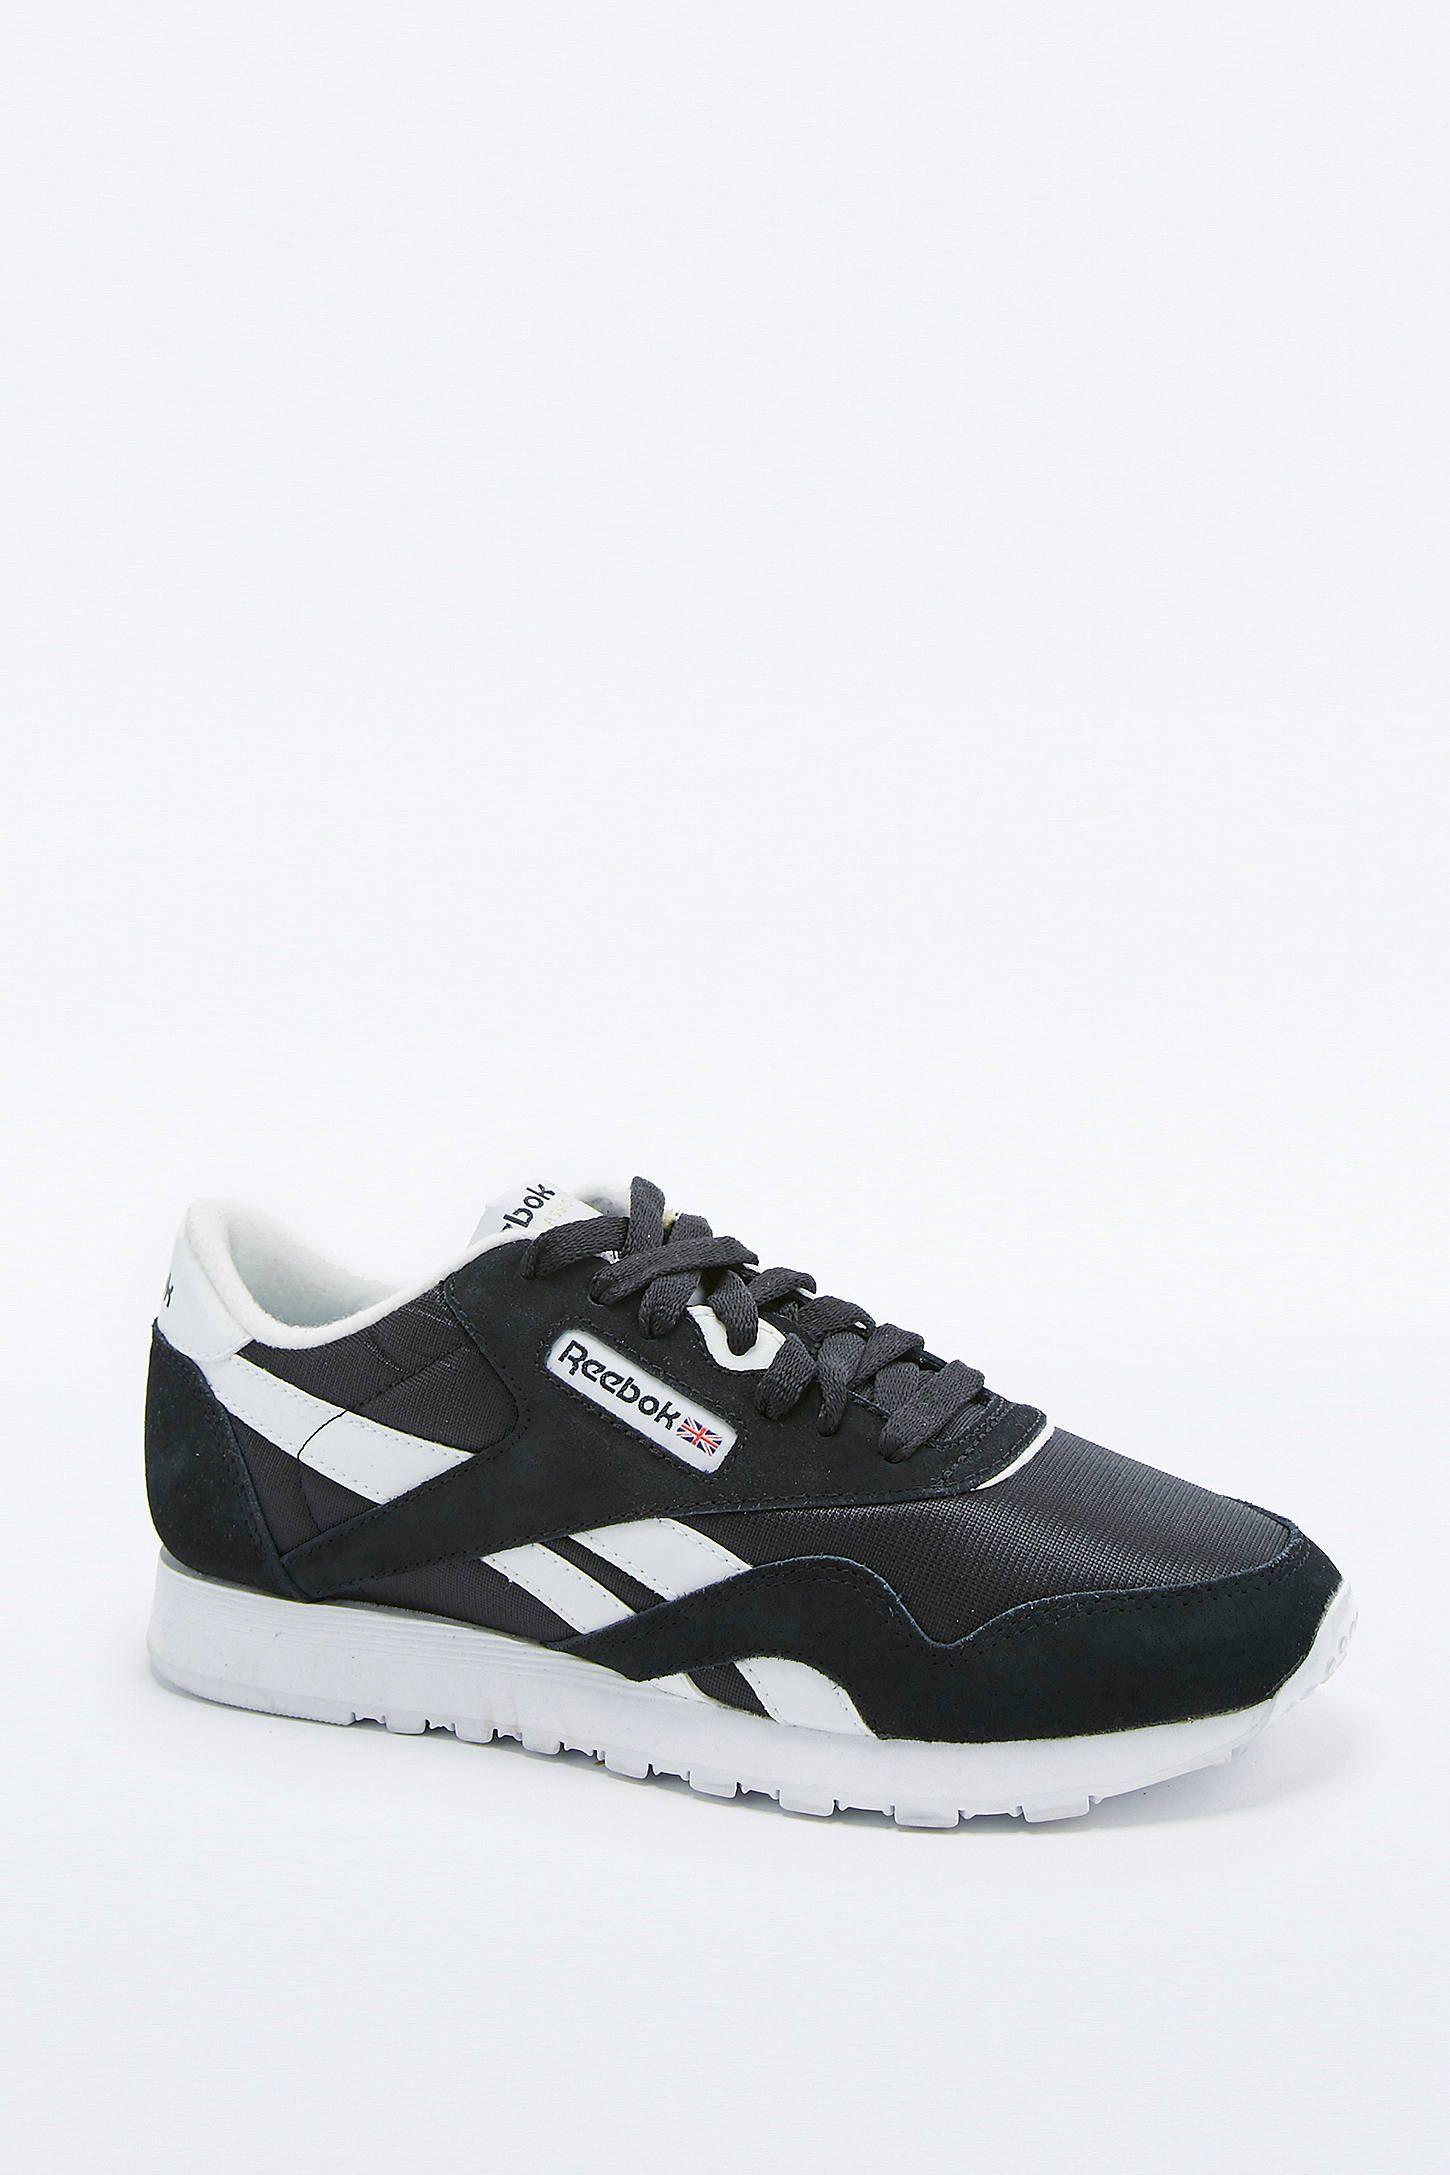 And White Classic Wear TrainersTo Reebok Black e29IYHDbWE